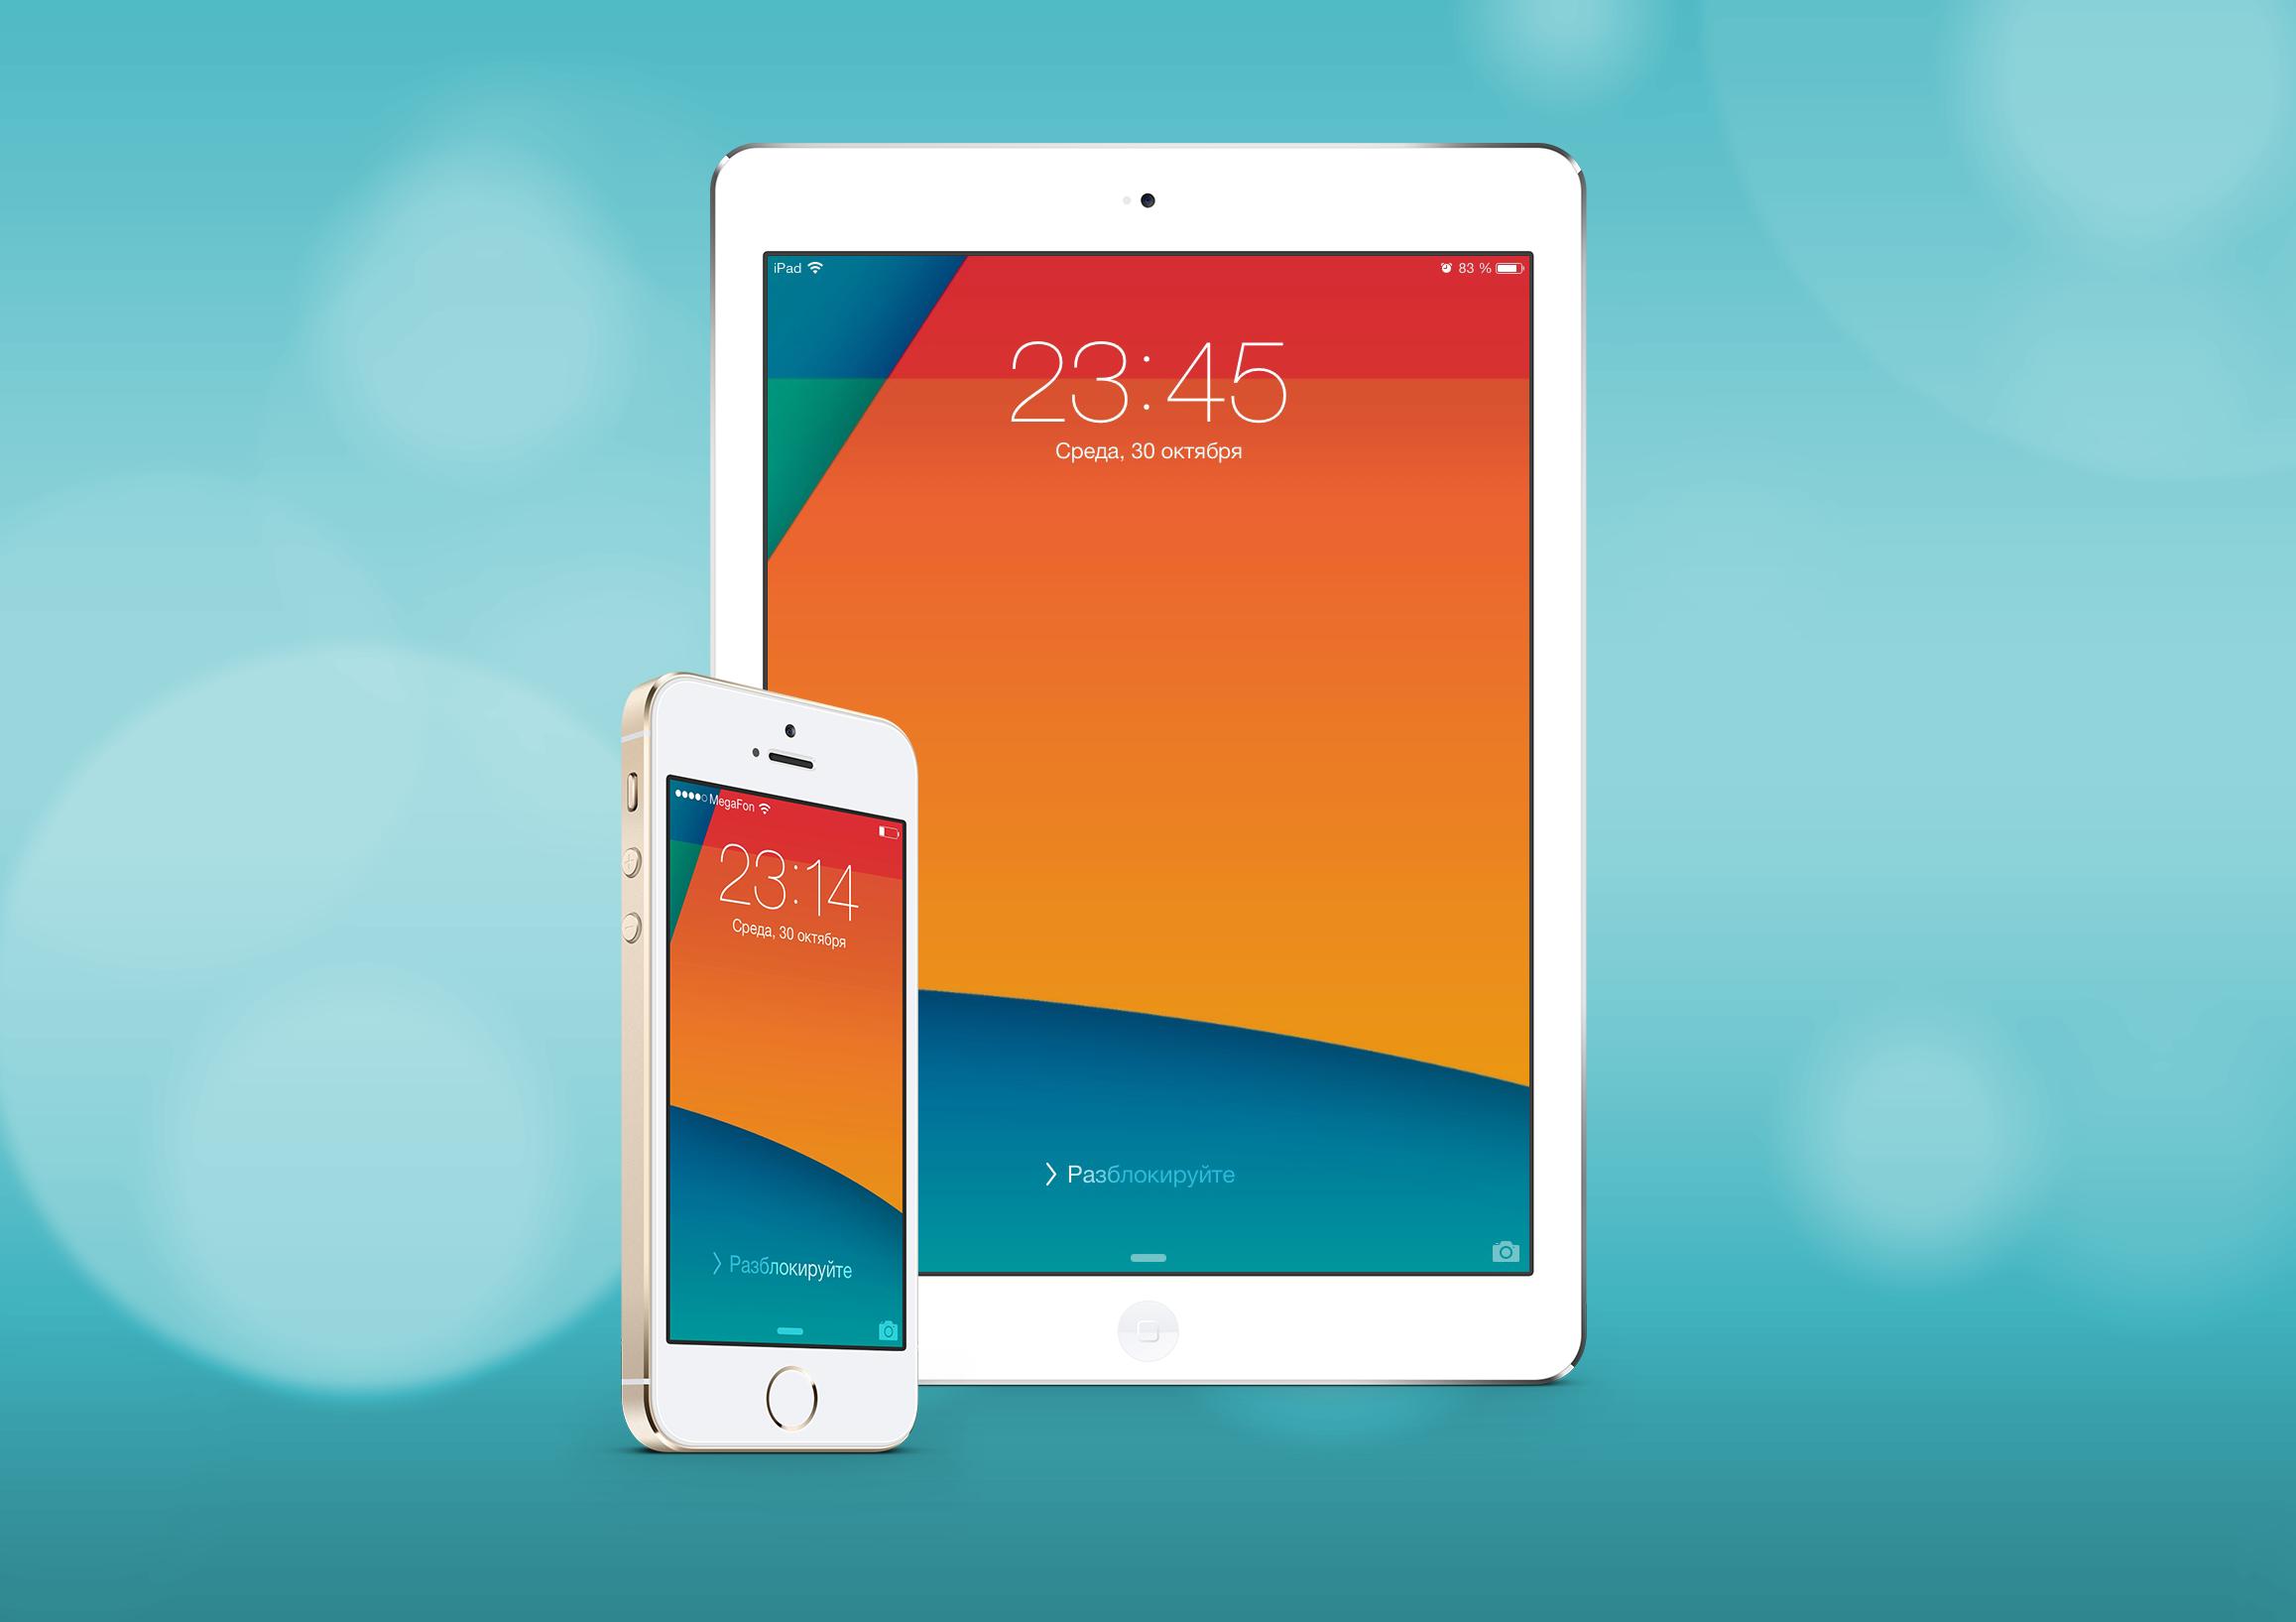 NEXUS Wallpaper for iPhone 5S/5C and iPad Air